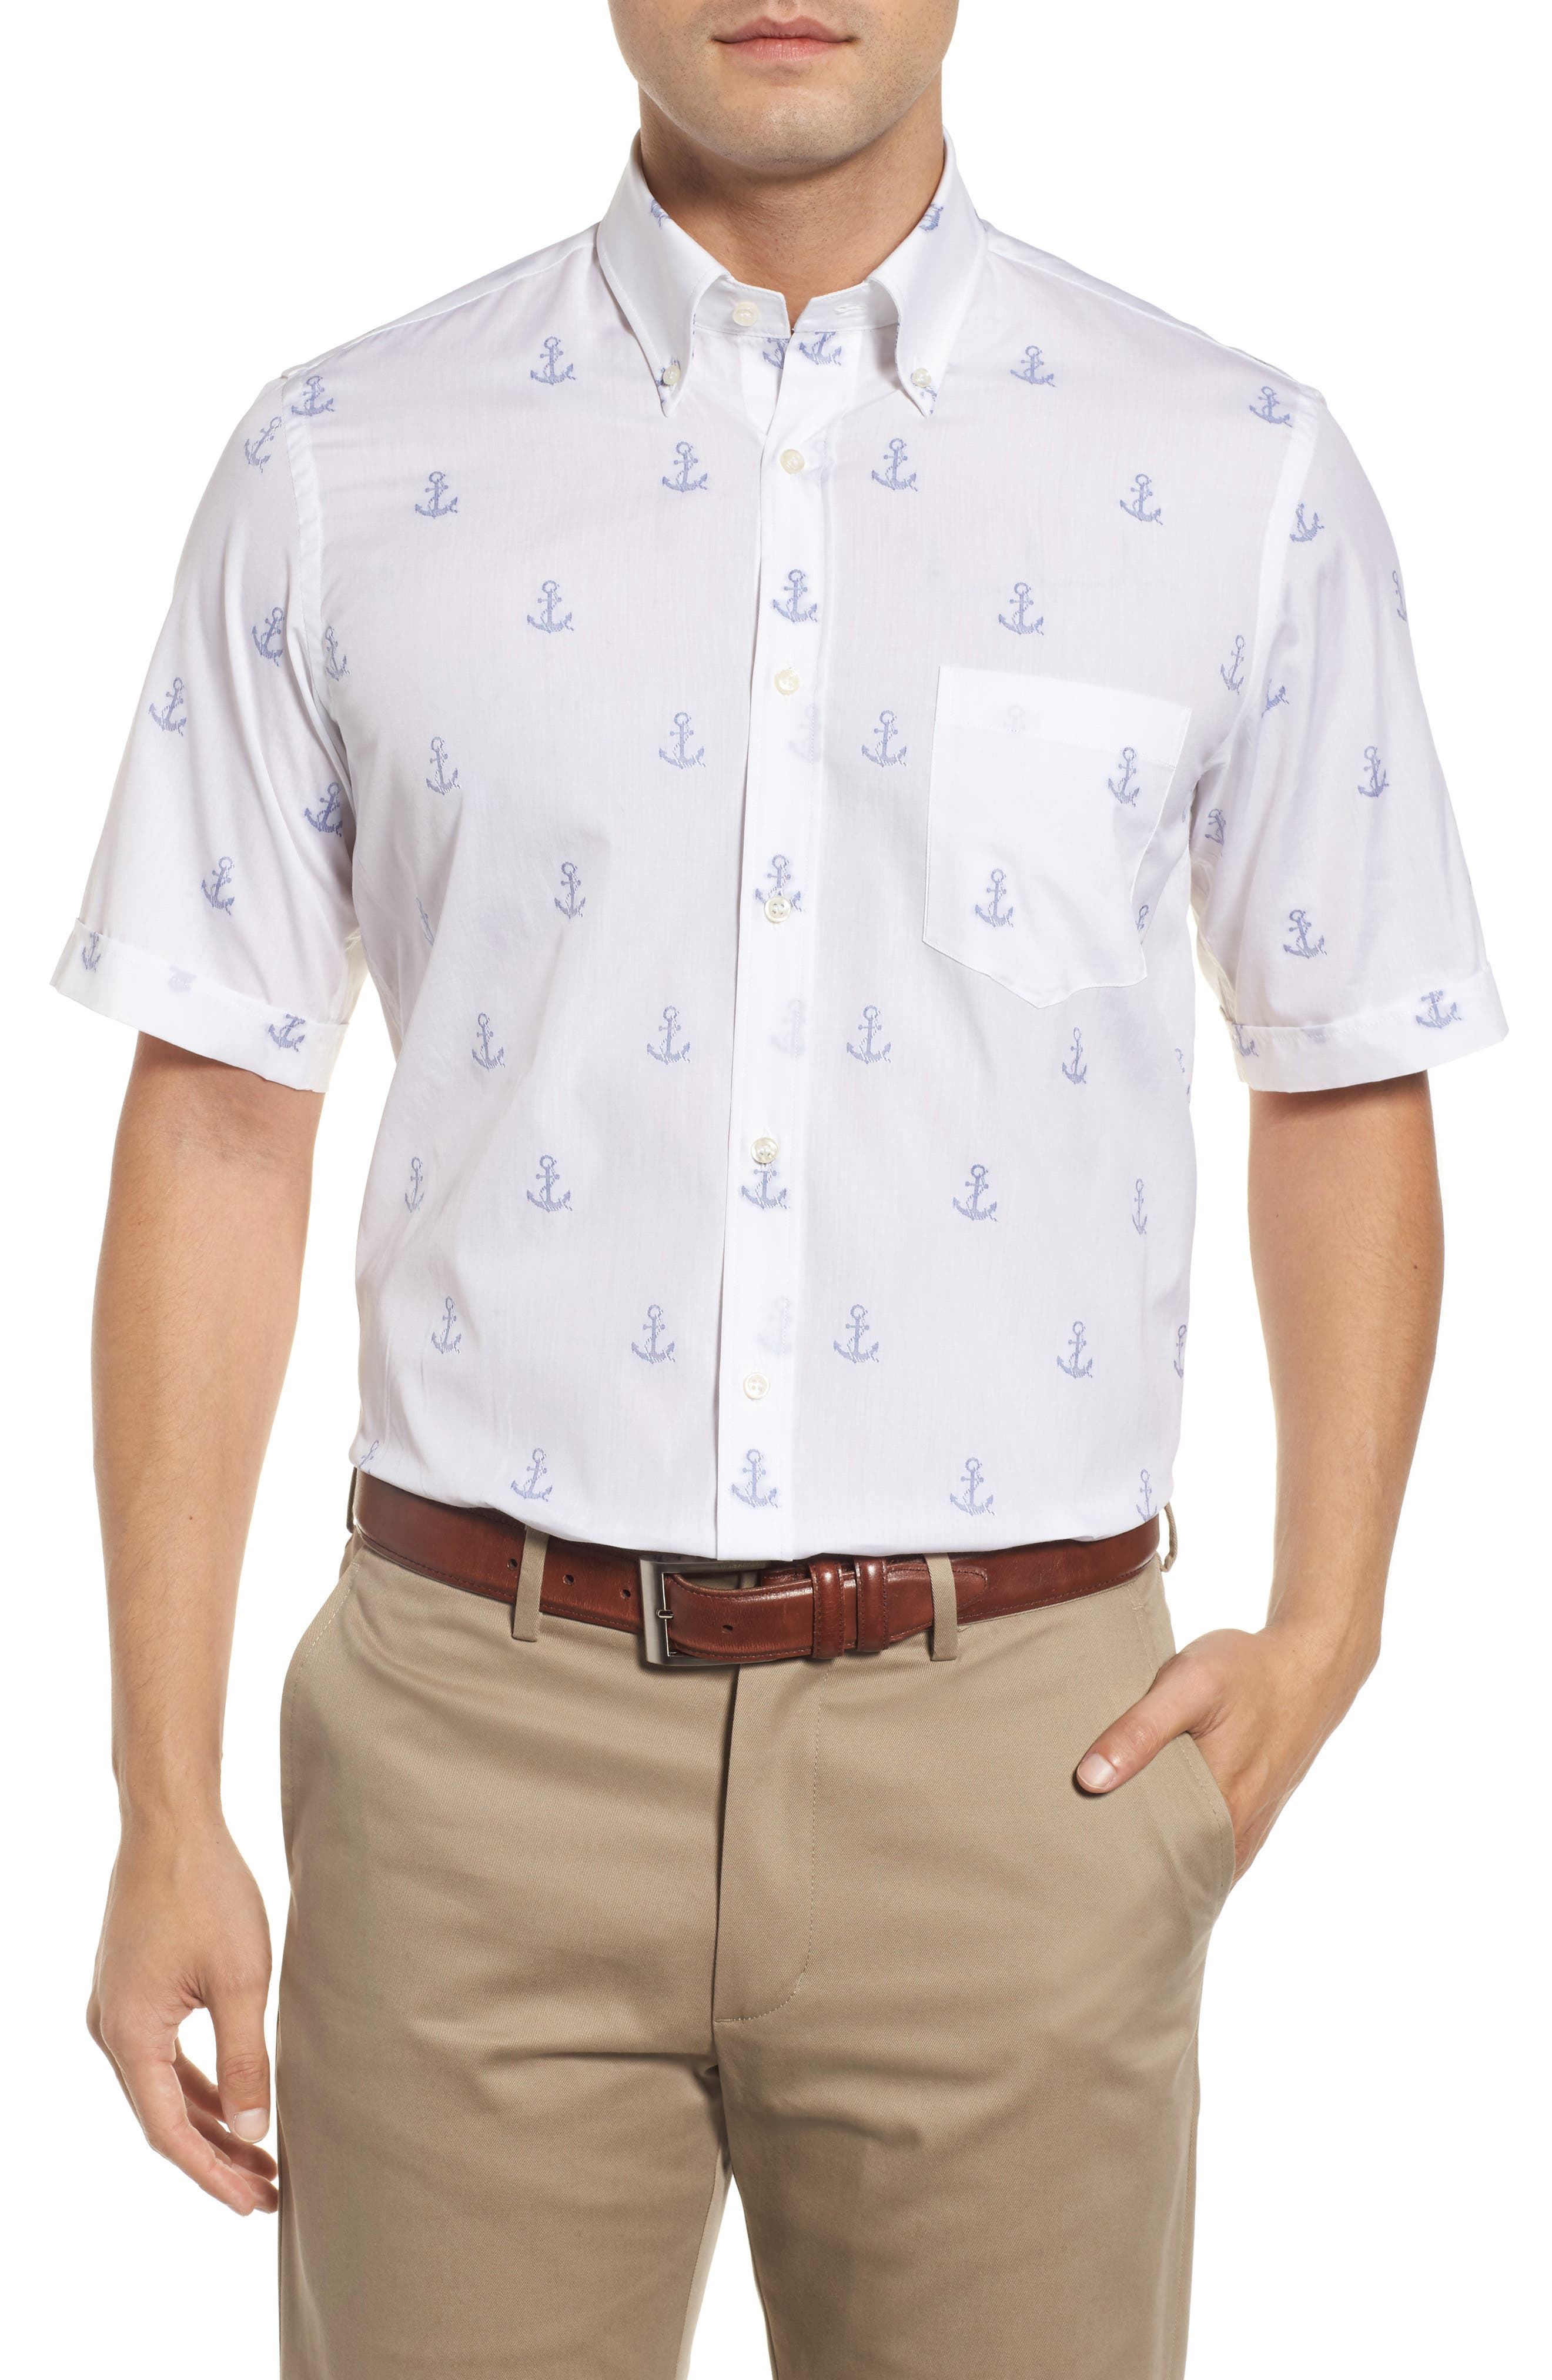 Paul&Shark Regular Fit Anchor Sport Shirt,                             Main thumbnail 1, color,                             White